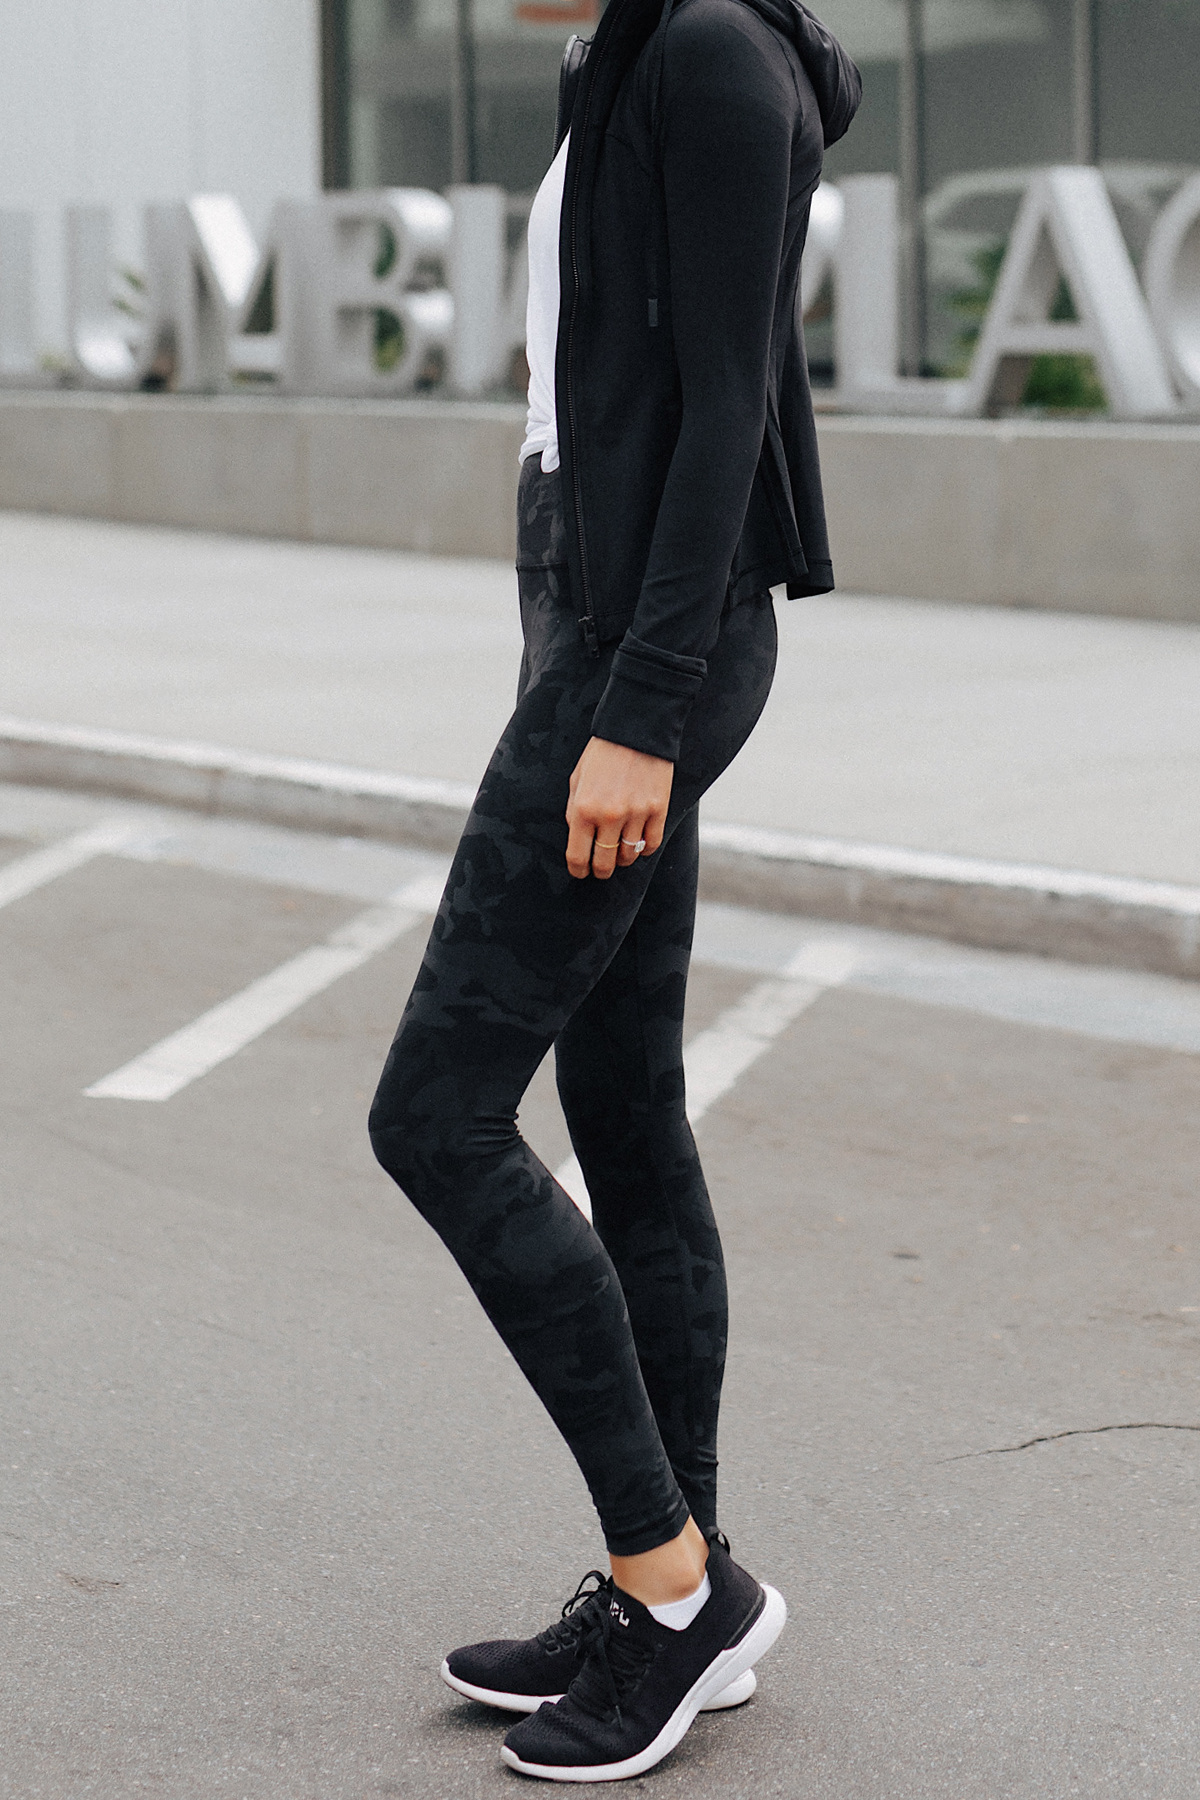 Woman Wearing Lululemon Align Pants Black Camo Print Lululemon Black Jacket White Top Fashion Jackson San Diego Fashion Blogger Fitness Style